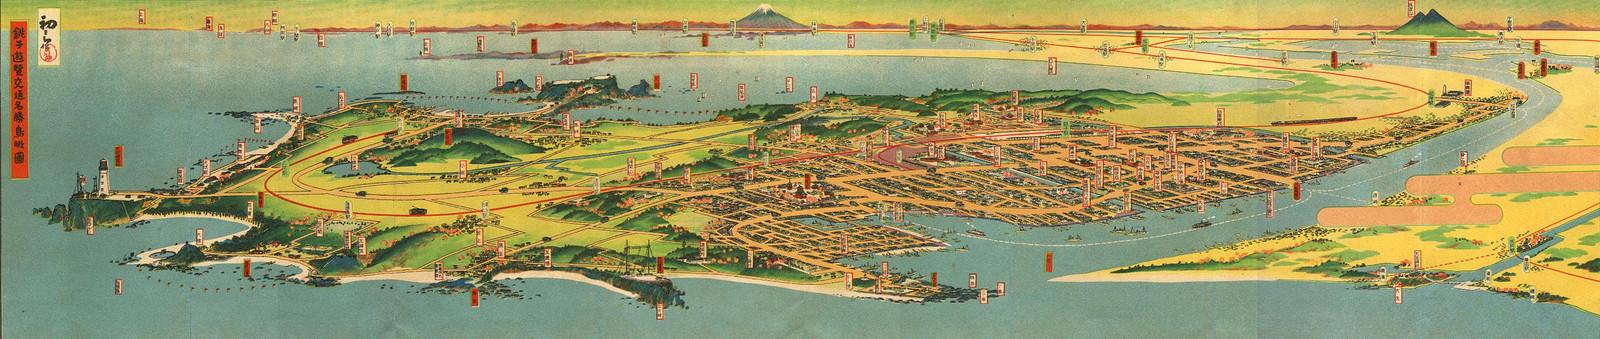 Panorama_choshi